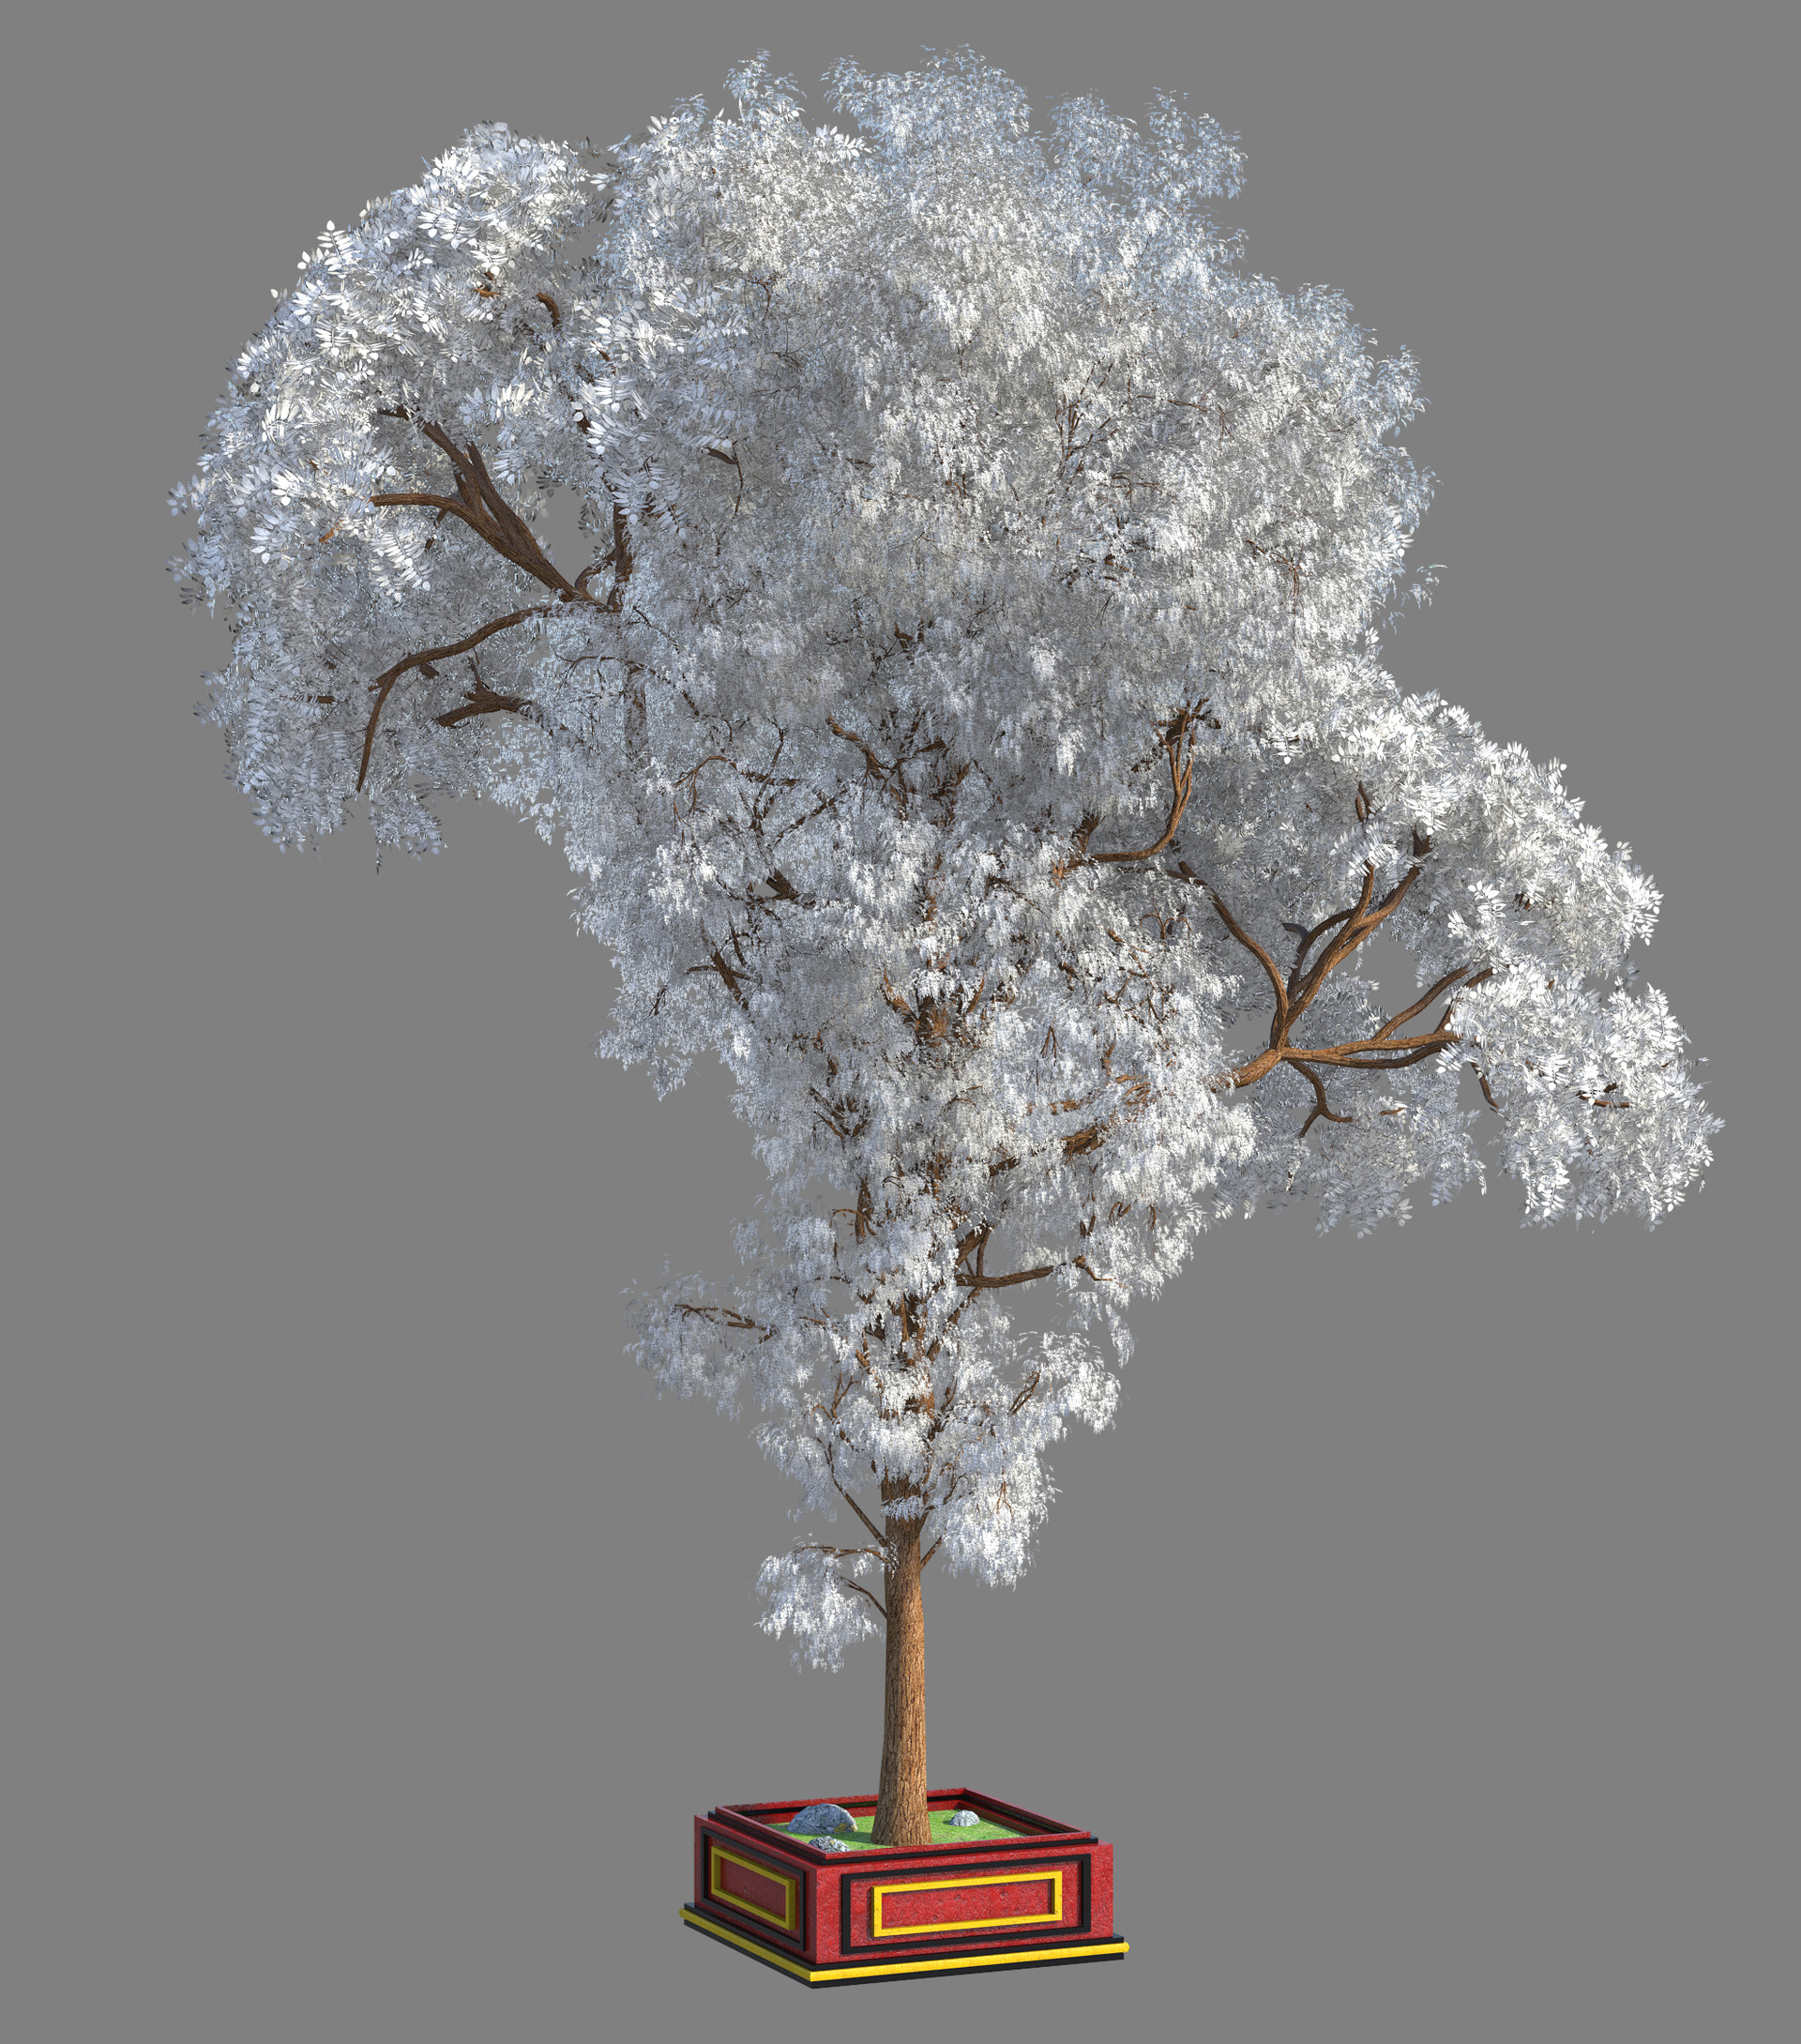 Marc mons tree2